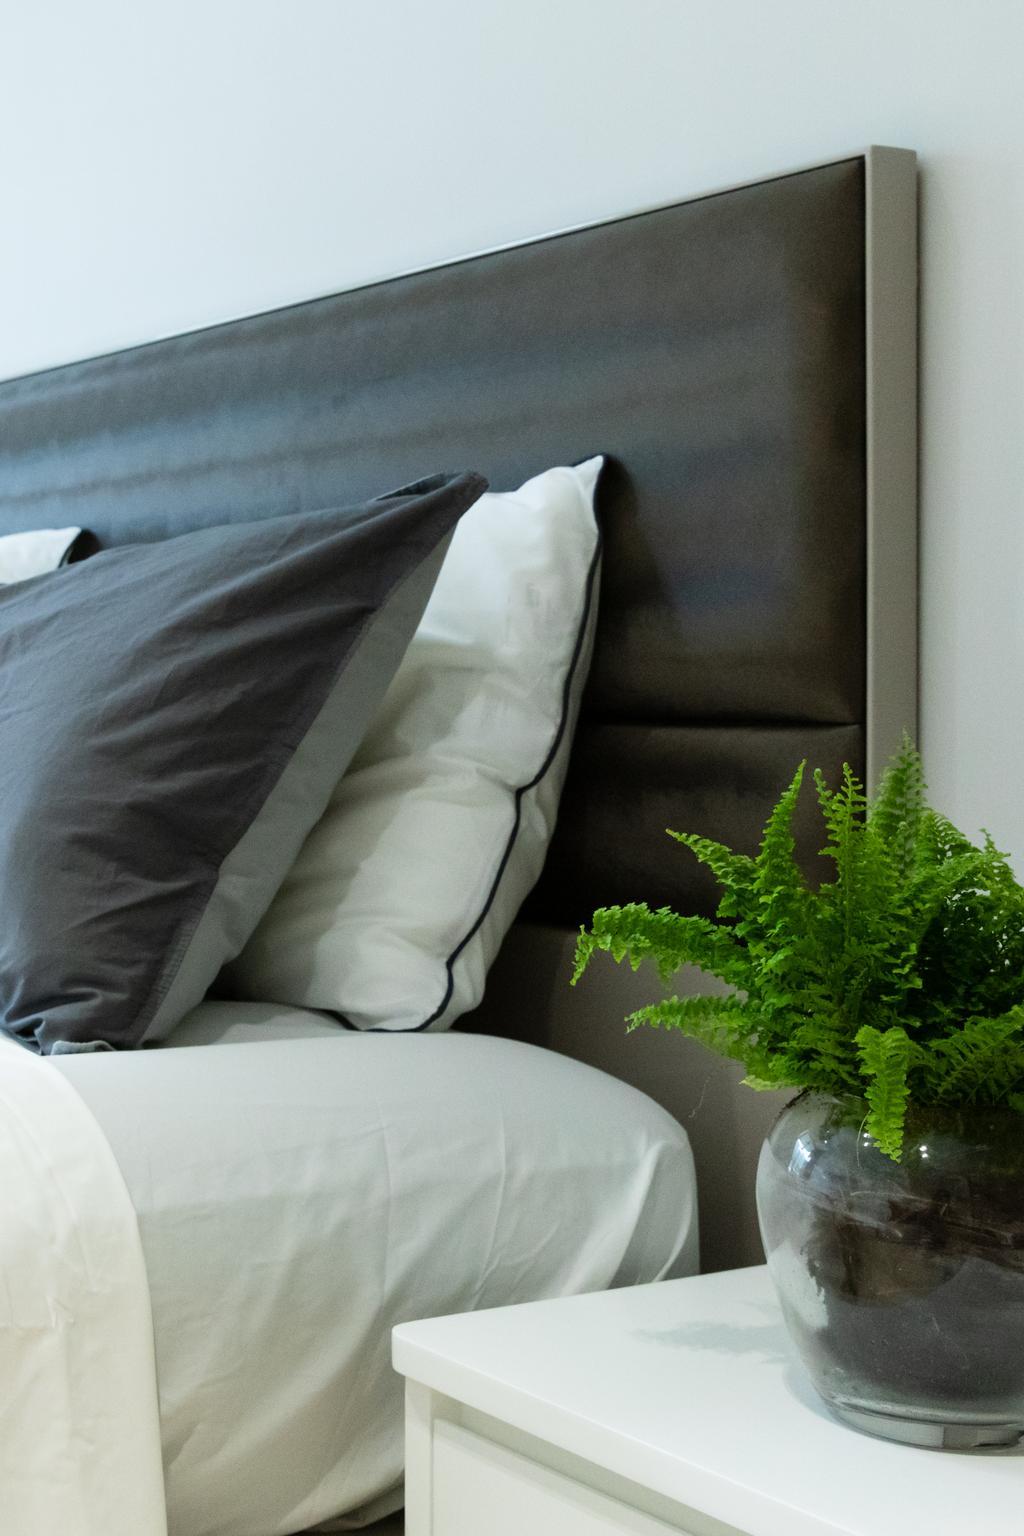 摩登, 私家樓, 睡房, Mount Pavilia, 室內設計師, B.R.G. Interior Design